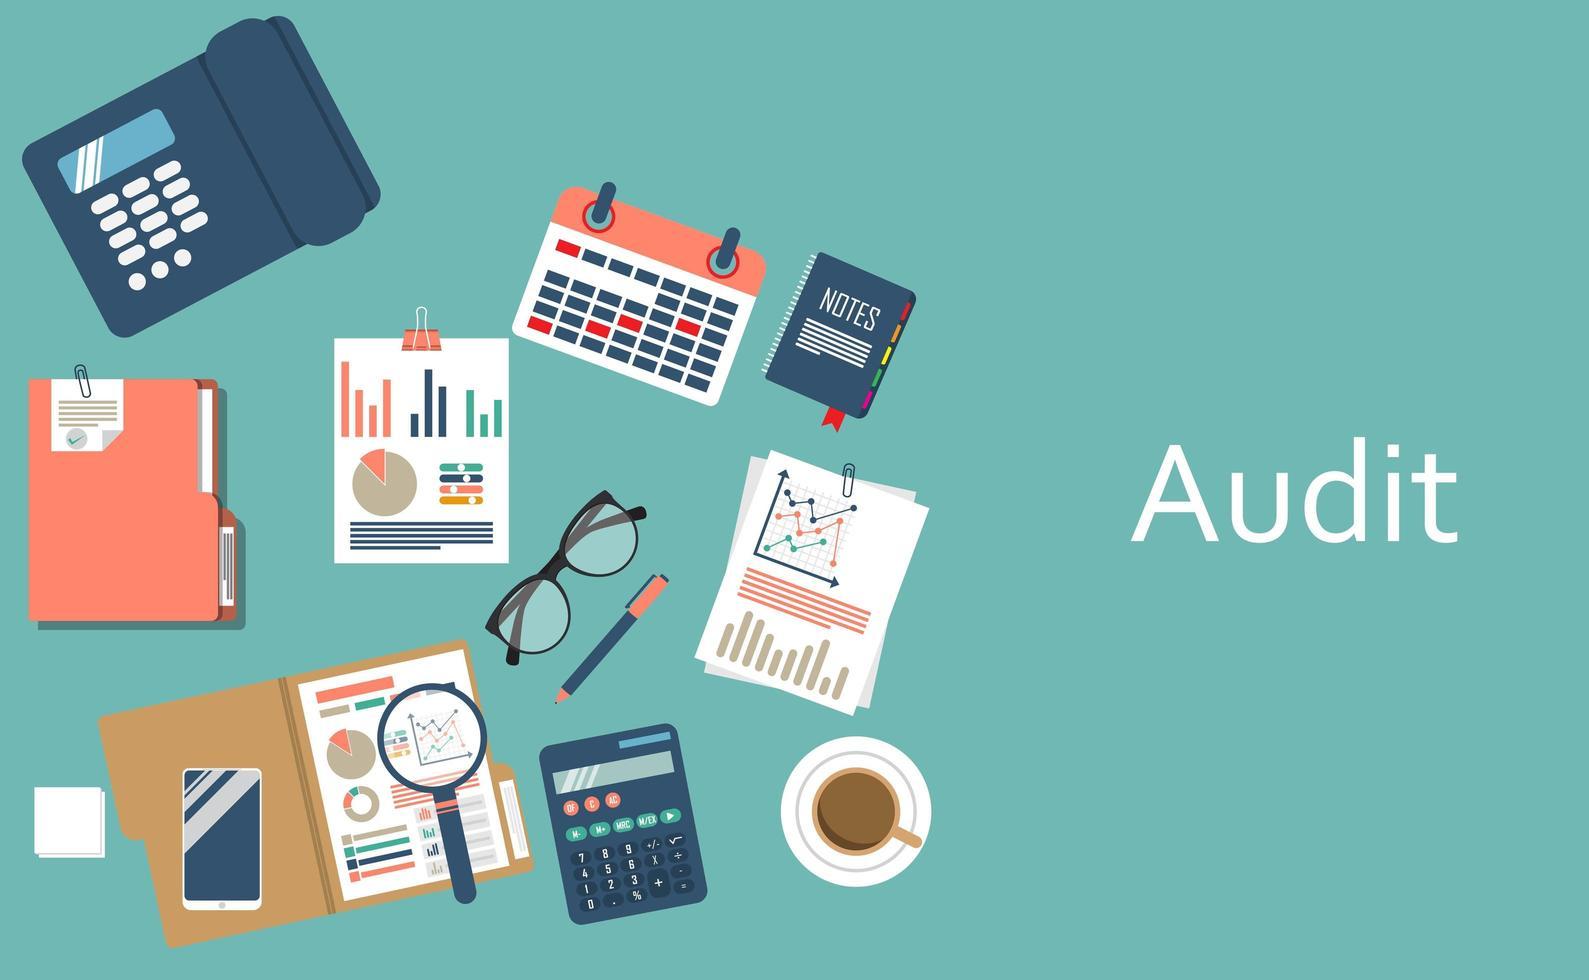 concepto de auditoría, fondo con objetos de oficina vector